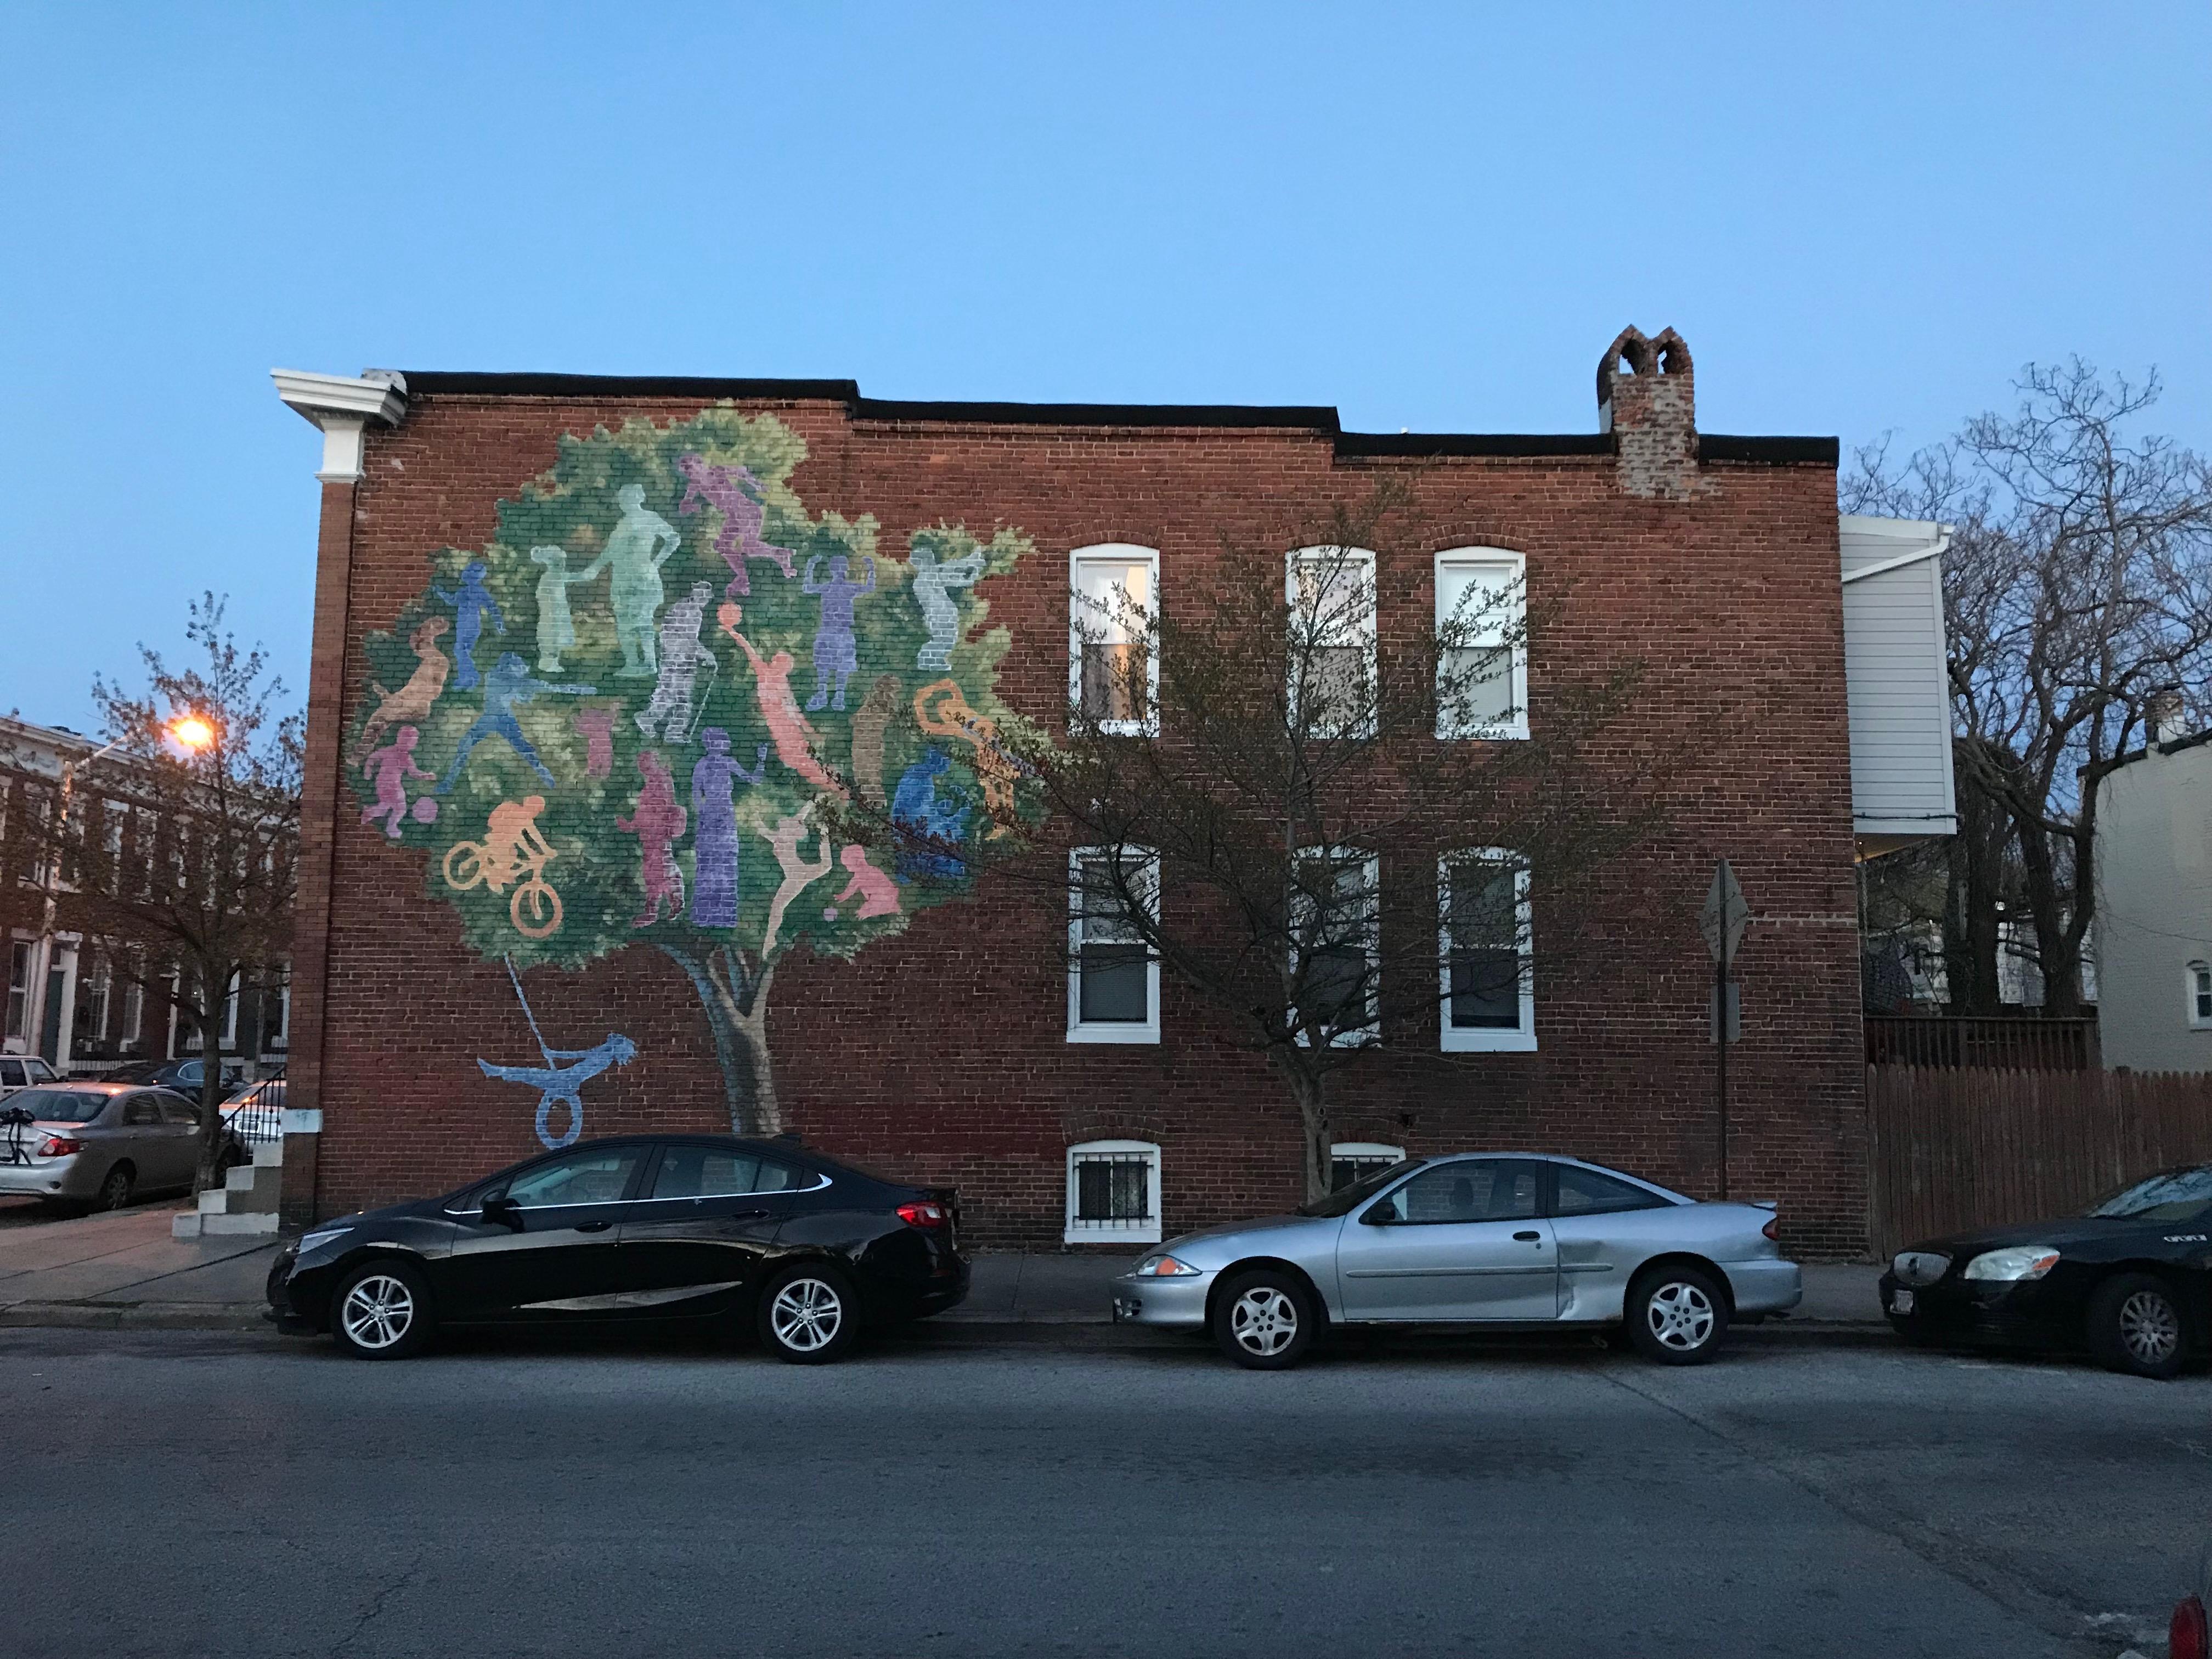 Rowhouse mural, 401 whitridge avenue, baltimore, md 21218 photo